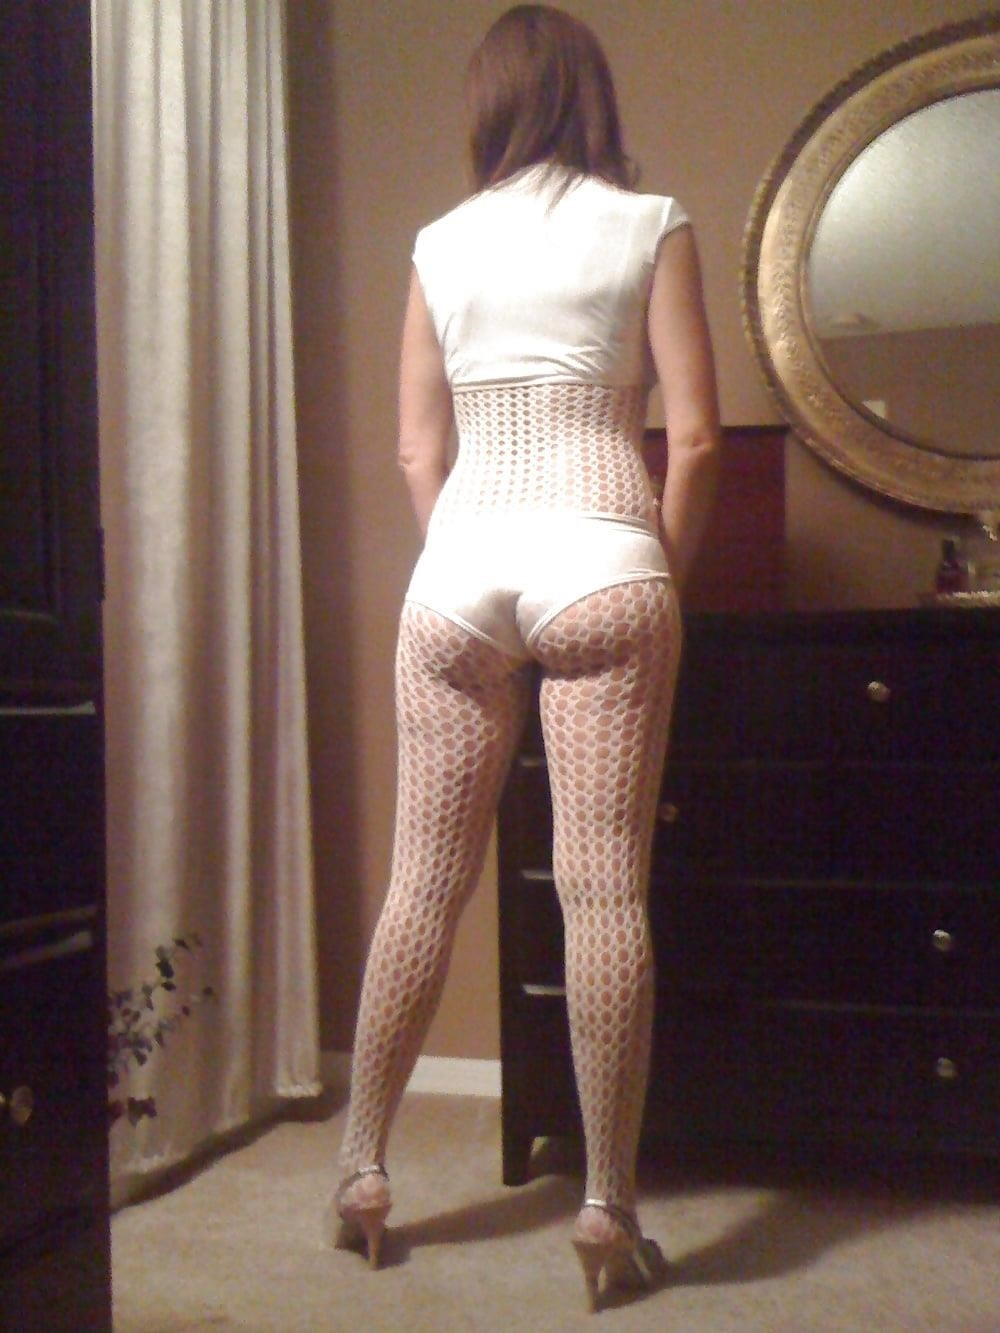 Jane the virgin sur netflix-7019